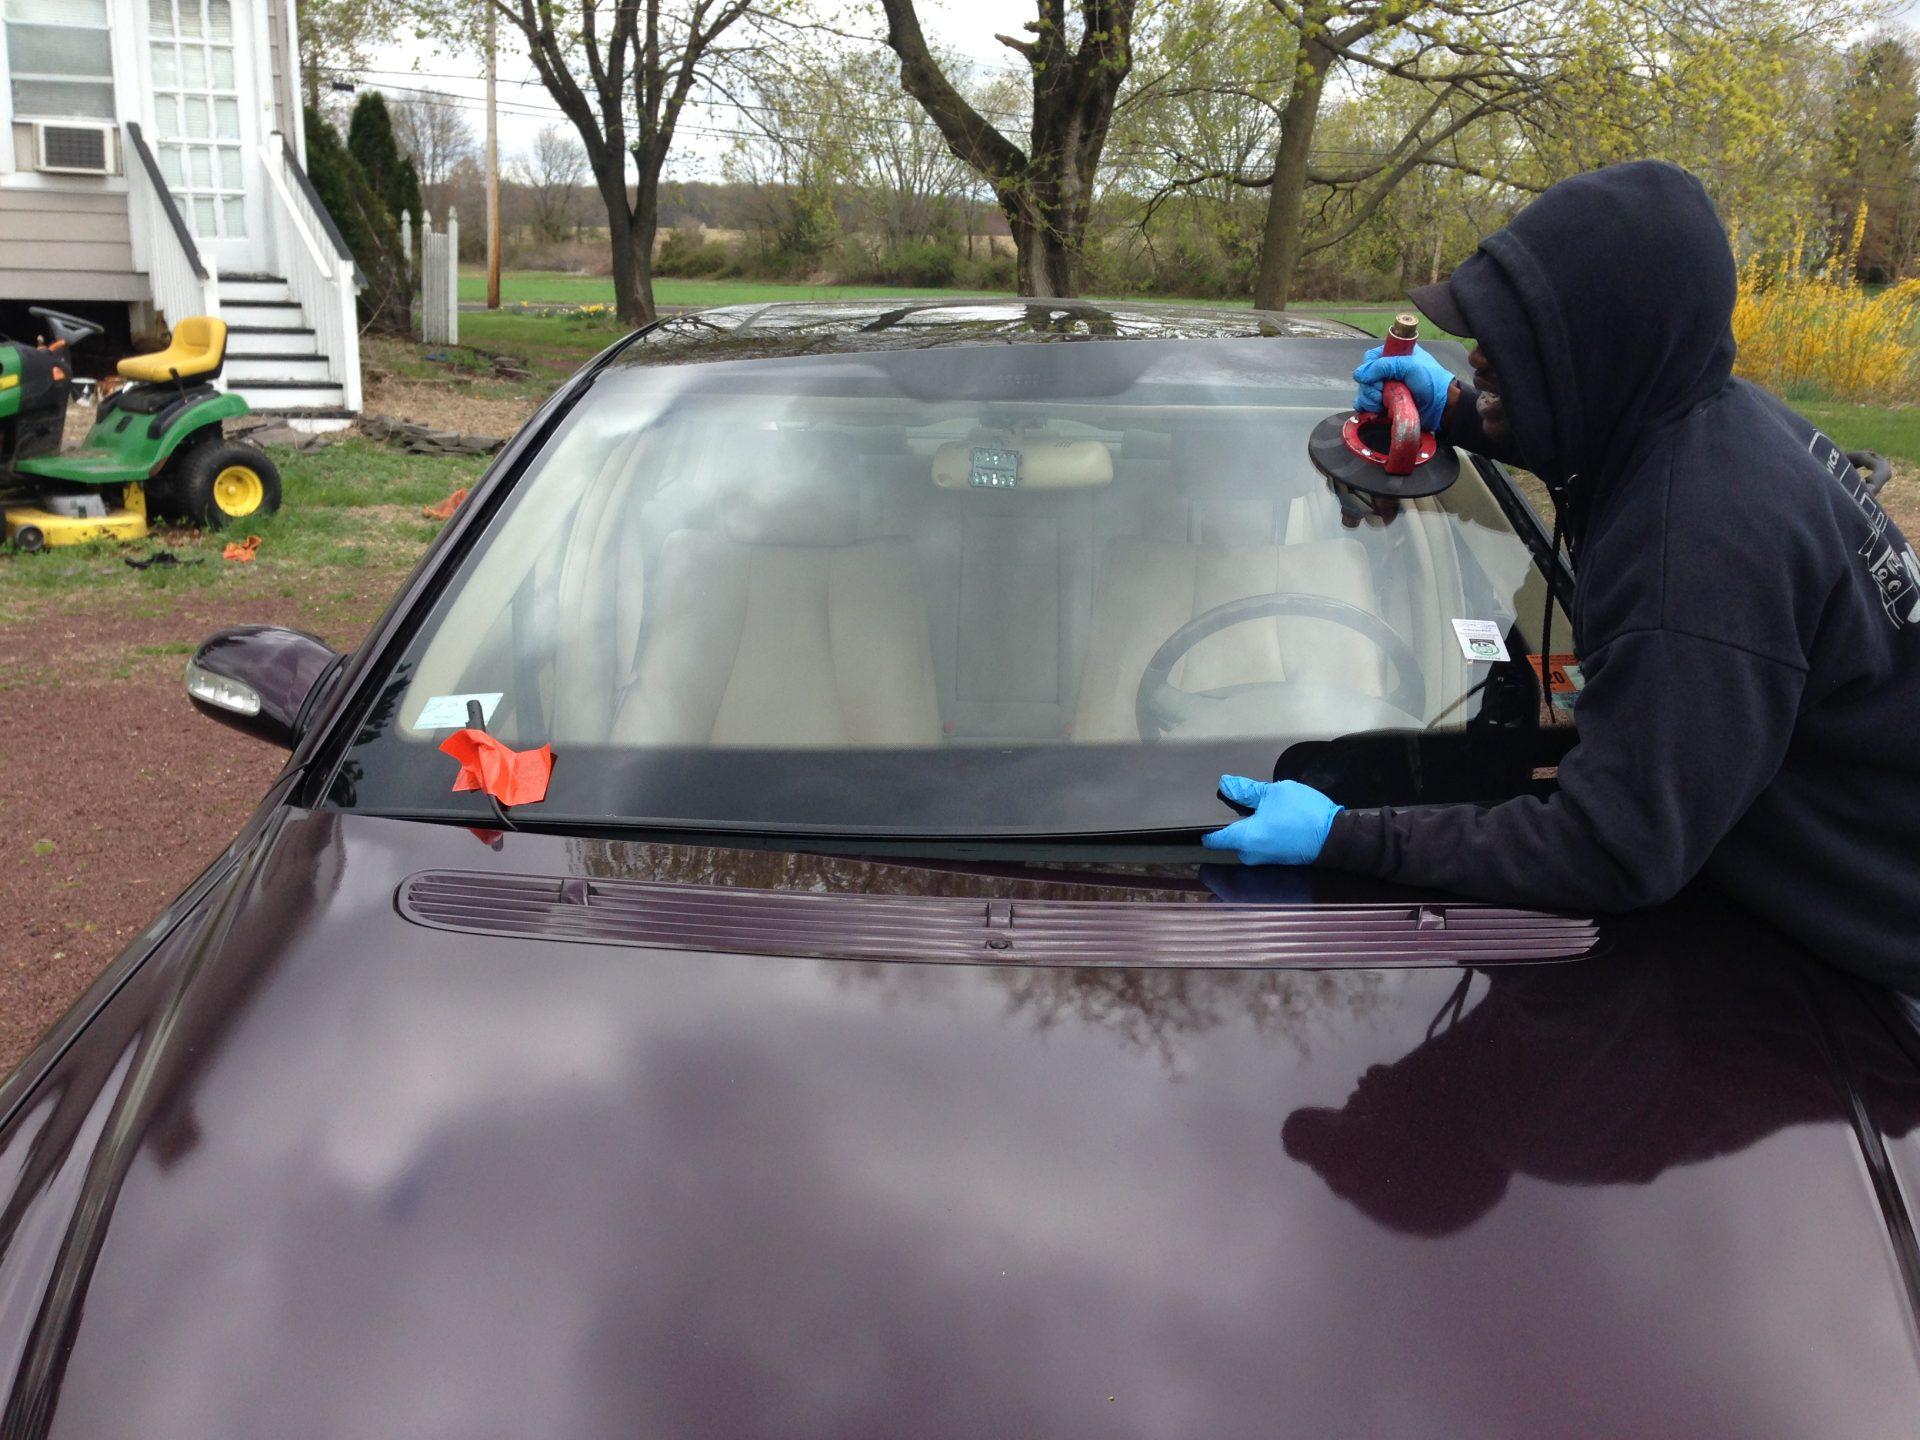 2002 Mercedes Benz windshield Install Platinum Auto Glass NJ @732-993-6844@platinumautoglassnj